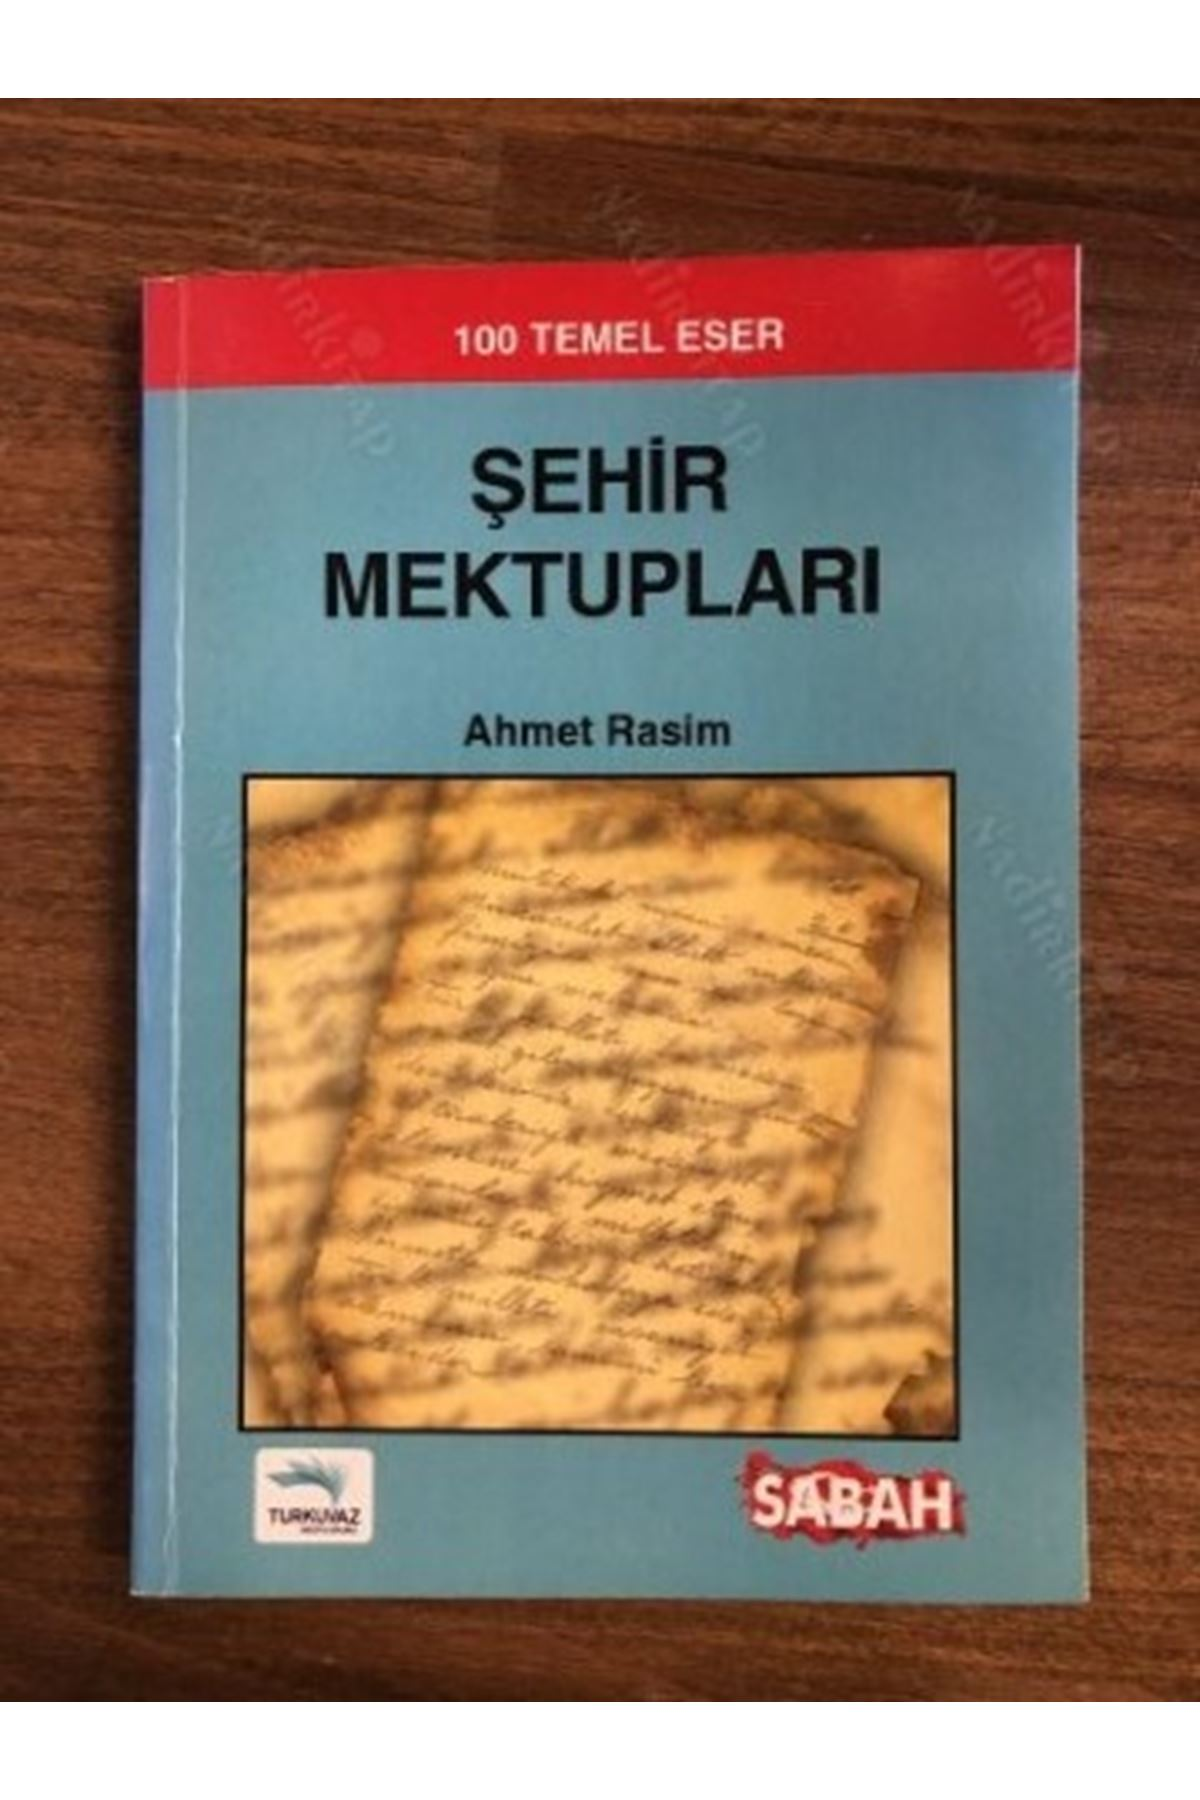 AHMET RASİM - ŞEHİR MEKTUPLARI